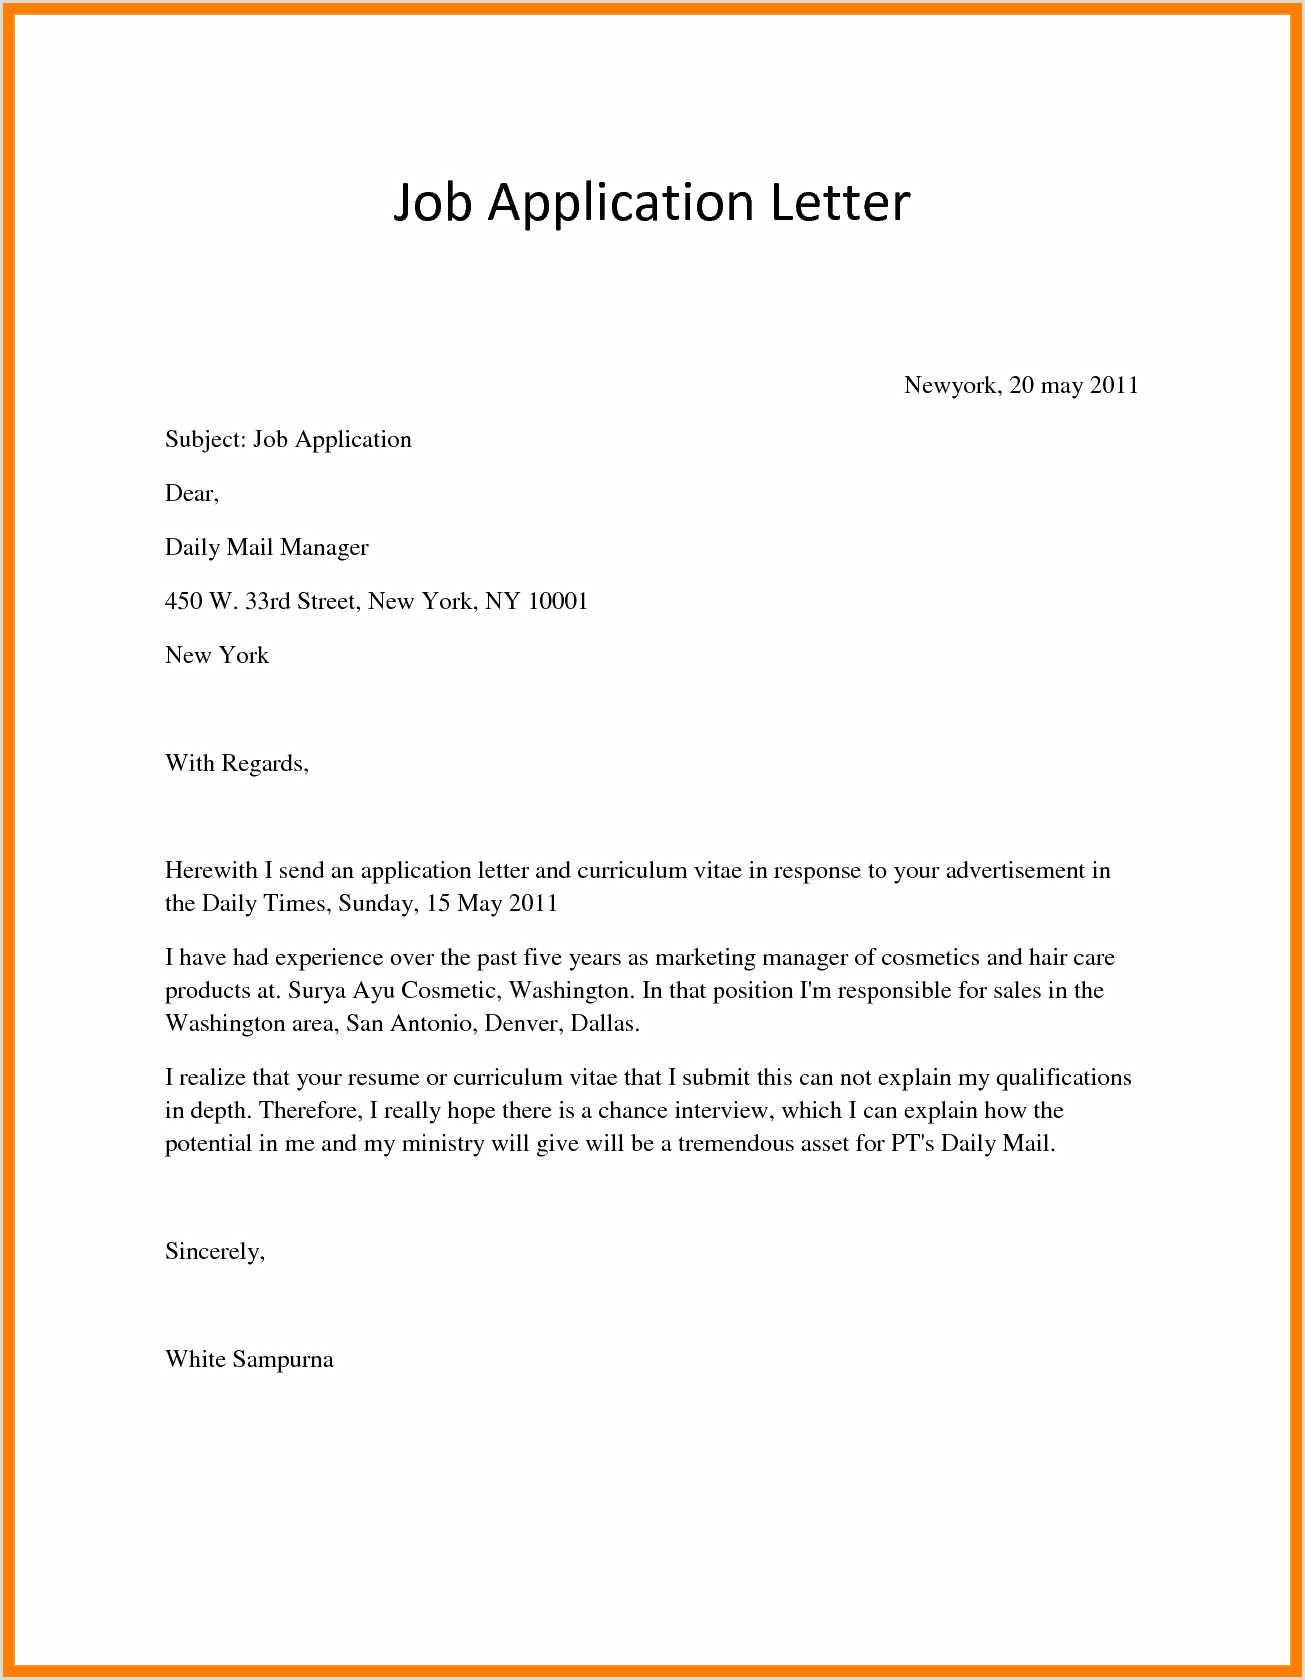 Resume format for Teaching Job In Pdf Sample Cv for Internship Pdf